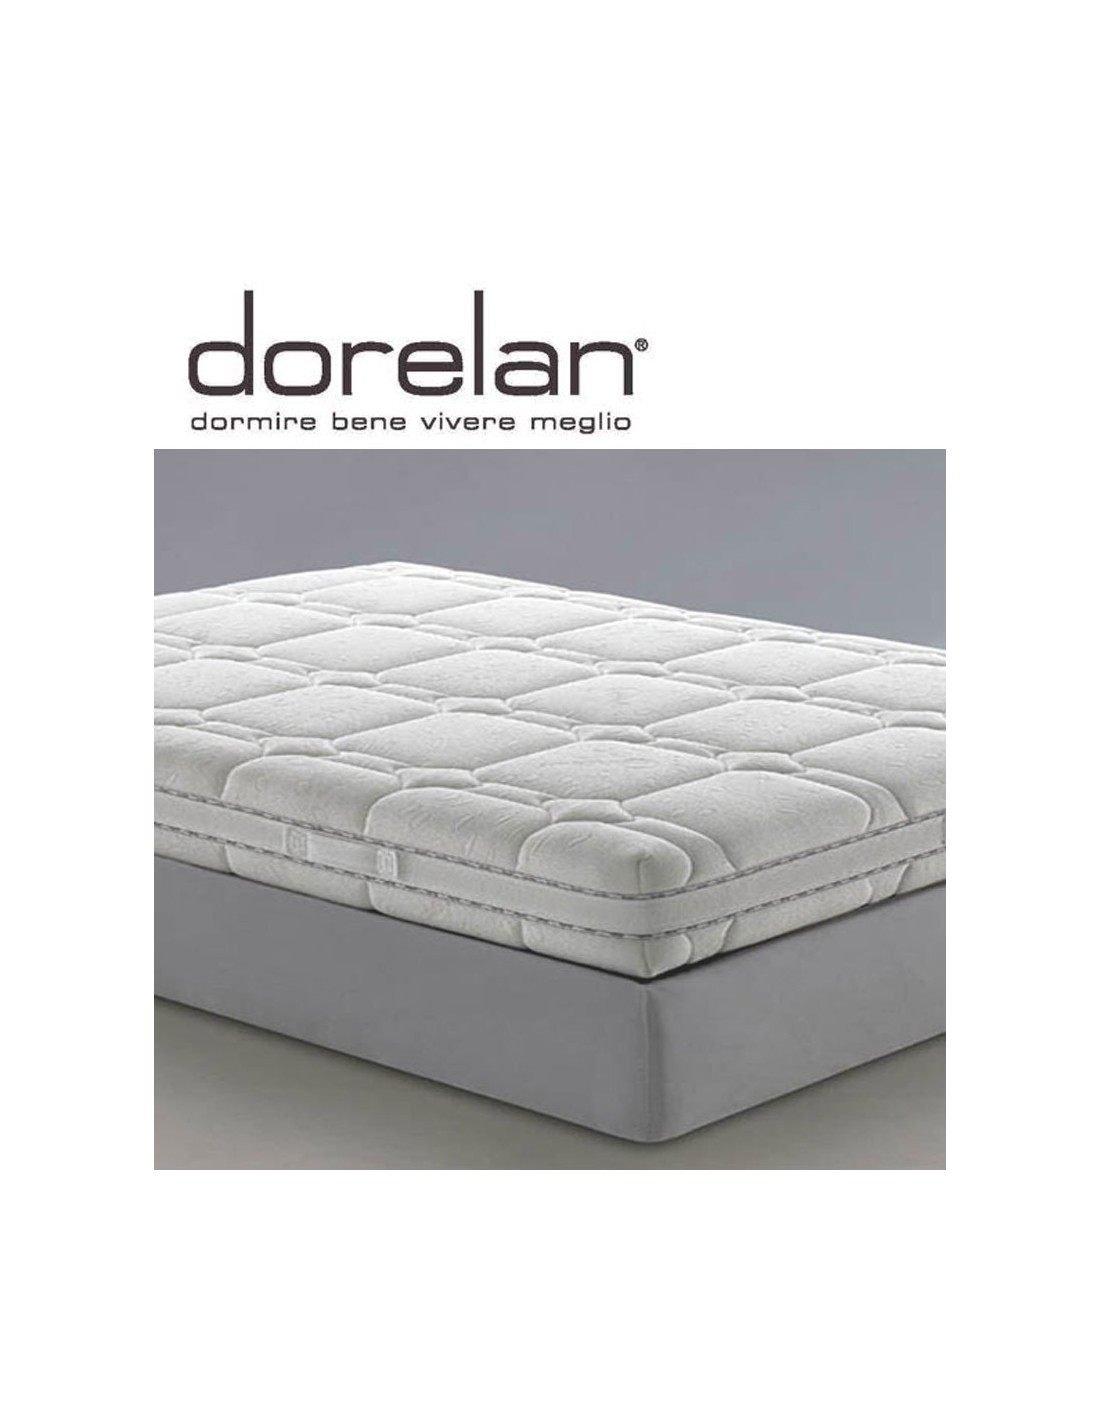 dorelan latex mattress Delice 160x190